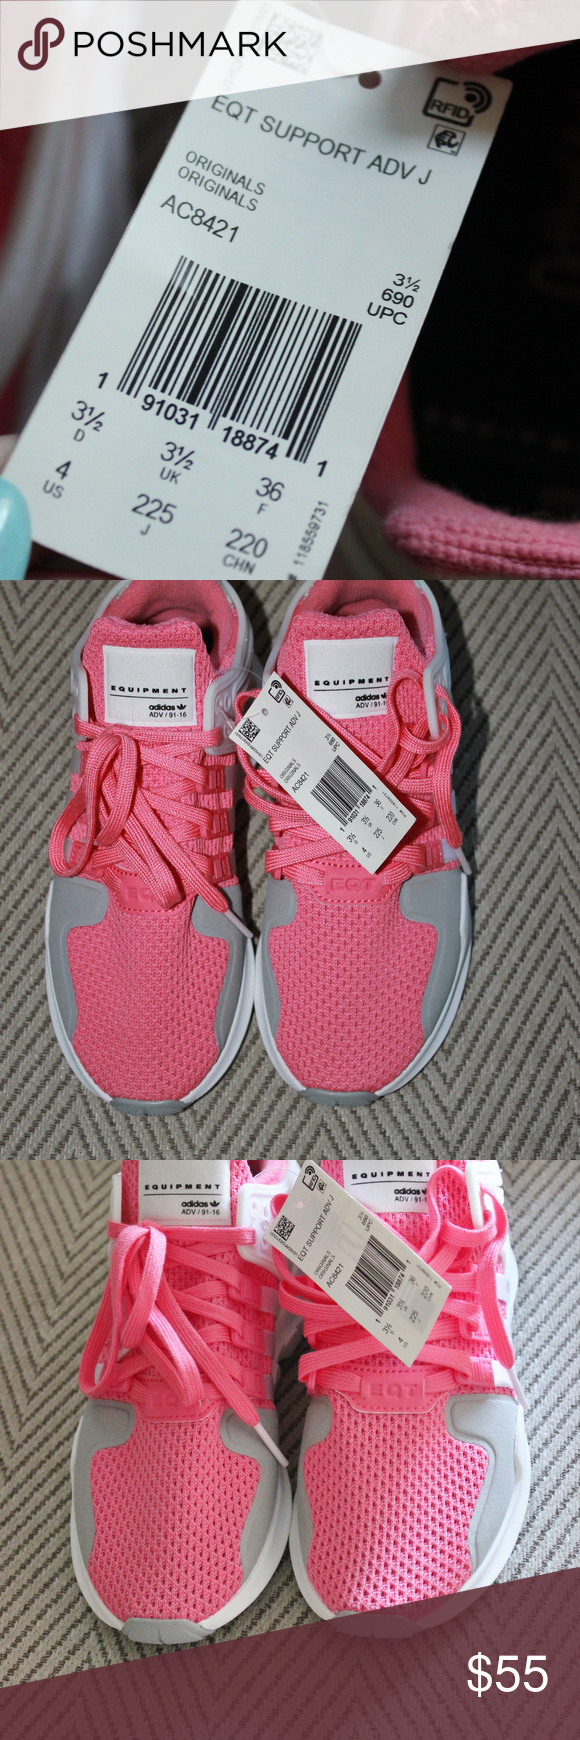 26d5c1b1c797 Form  Adidas Originals Girls Sz 4 Pink and White NWT  NWOB Girls Adidas  Originals EQT Support ADV - Grade School Shoes Chalk Pink. Size 4 girls  adidas Shoes ...